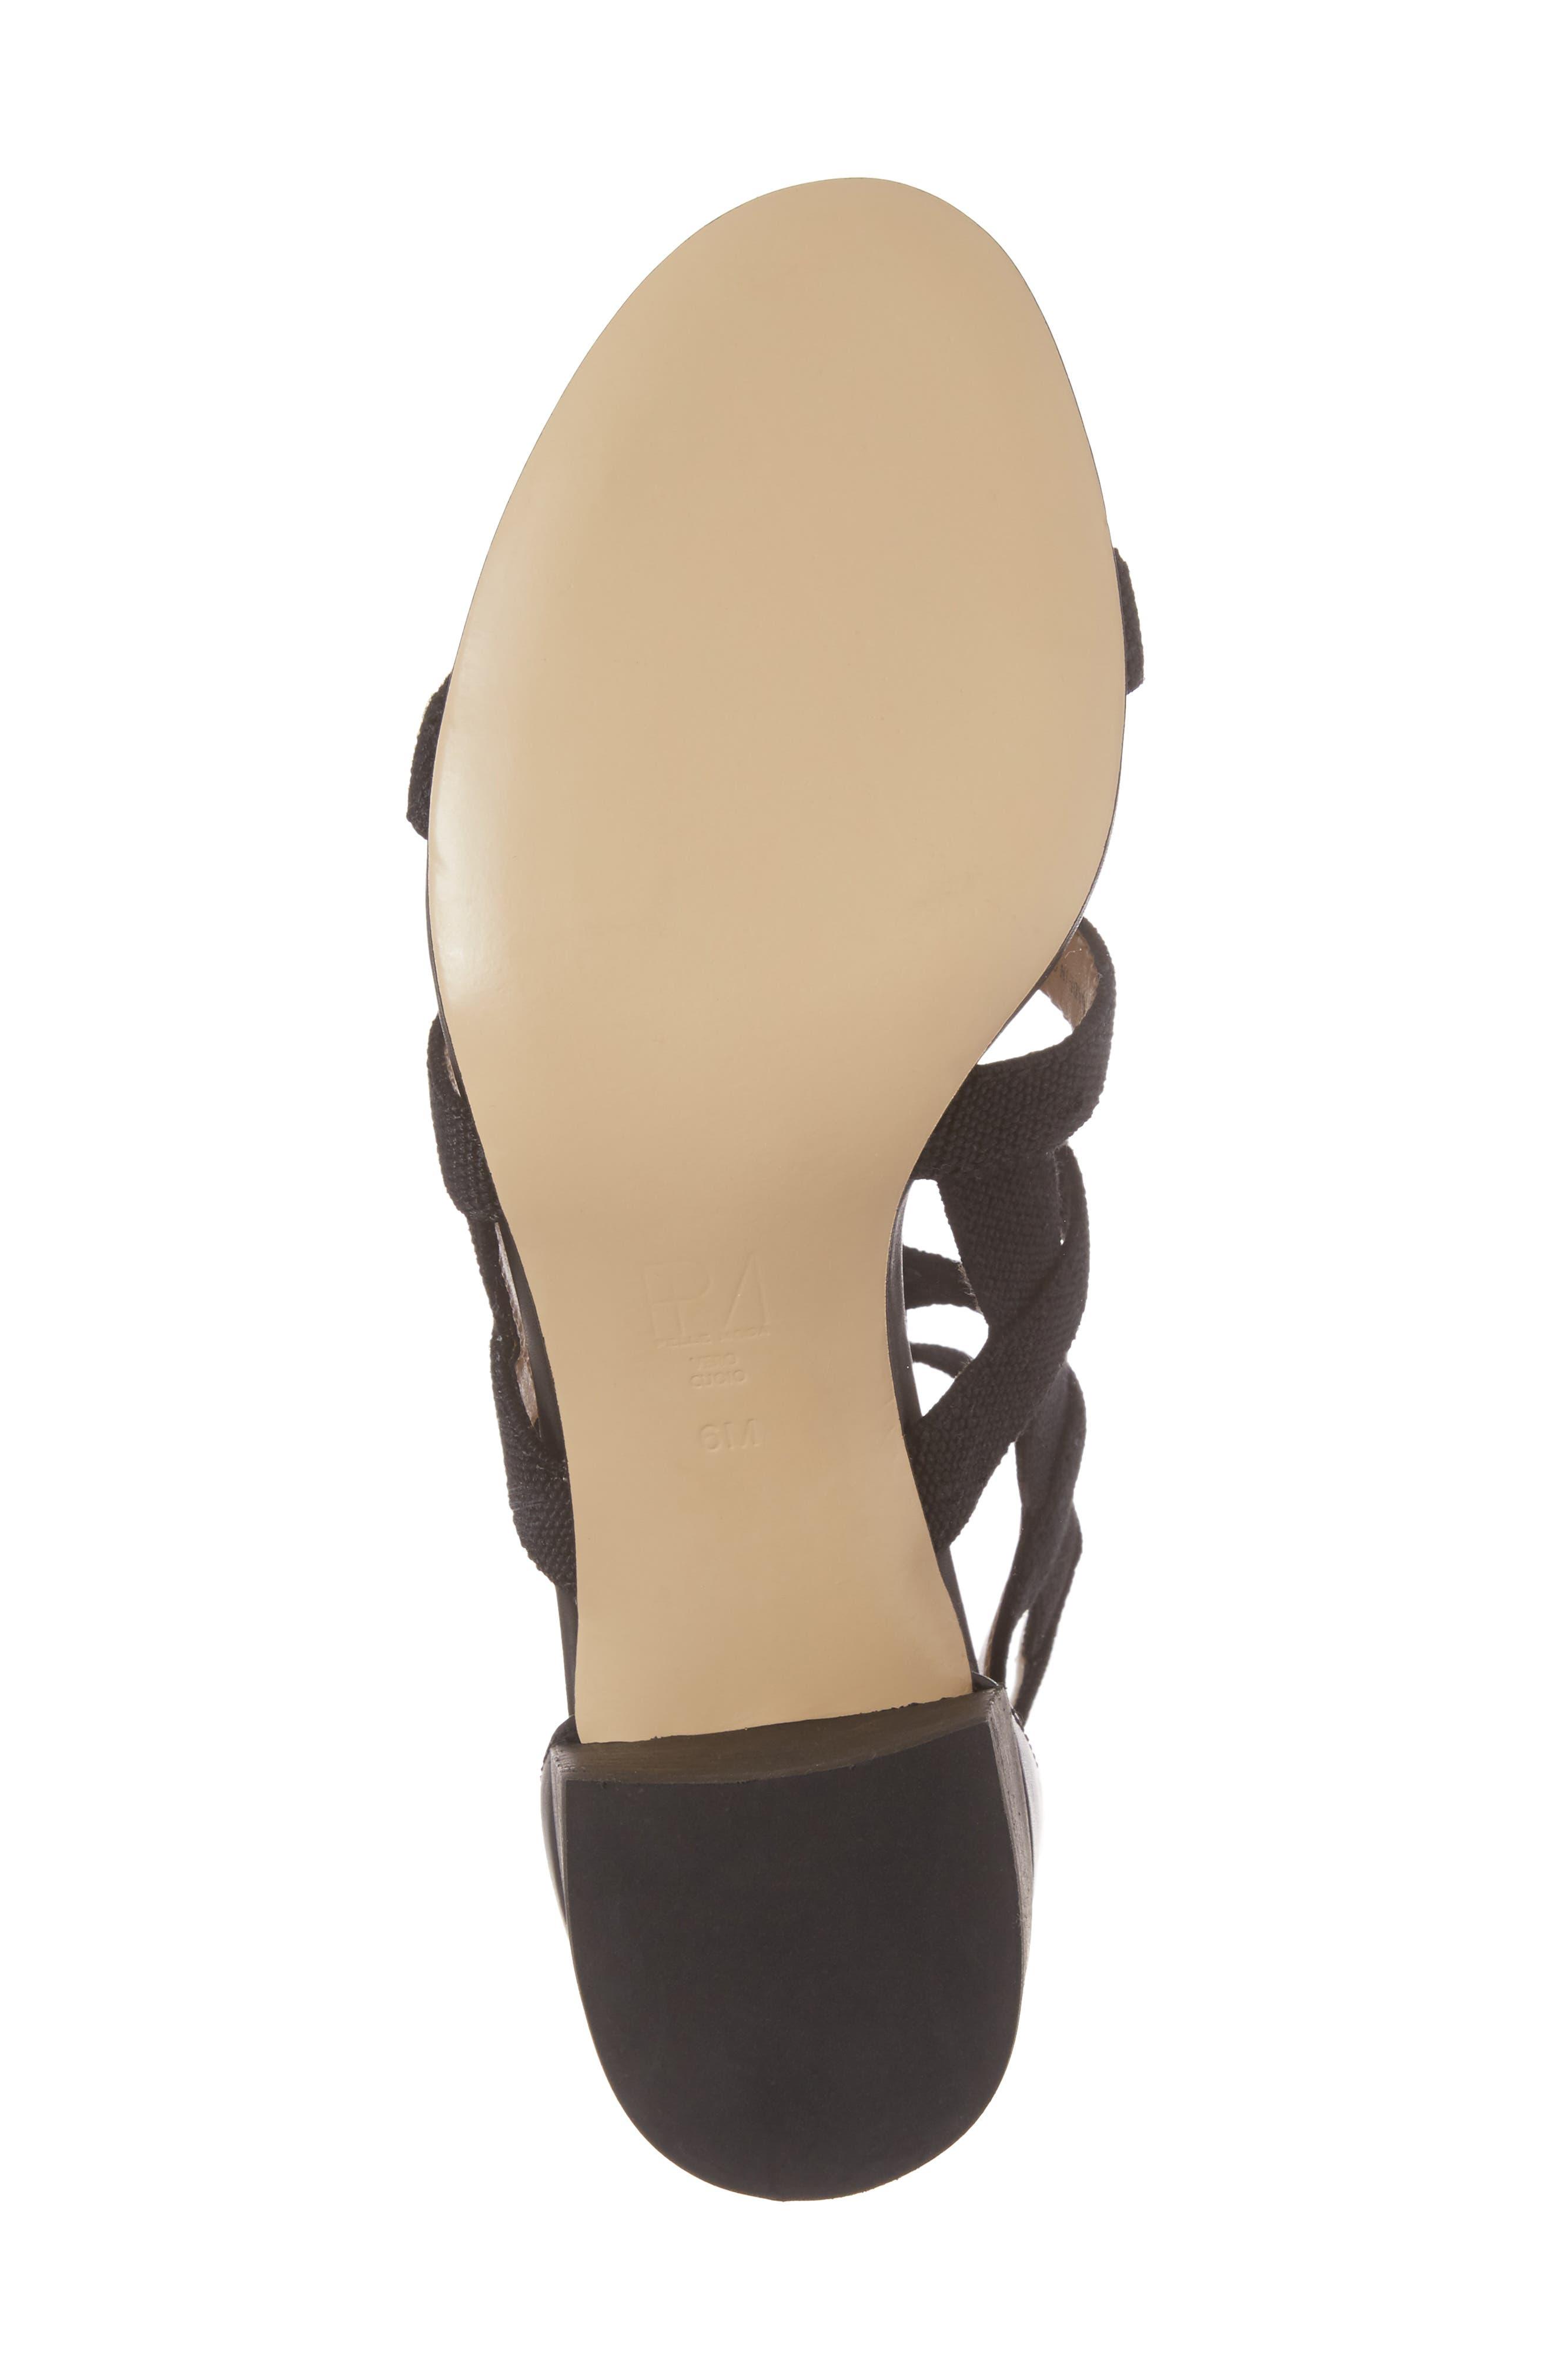 Unkar Block Heel Sandal,                             Alternate thumbnail 6, color,                             001